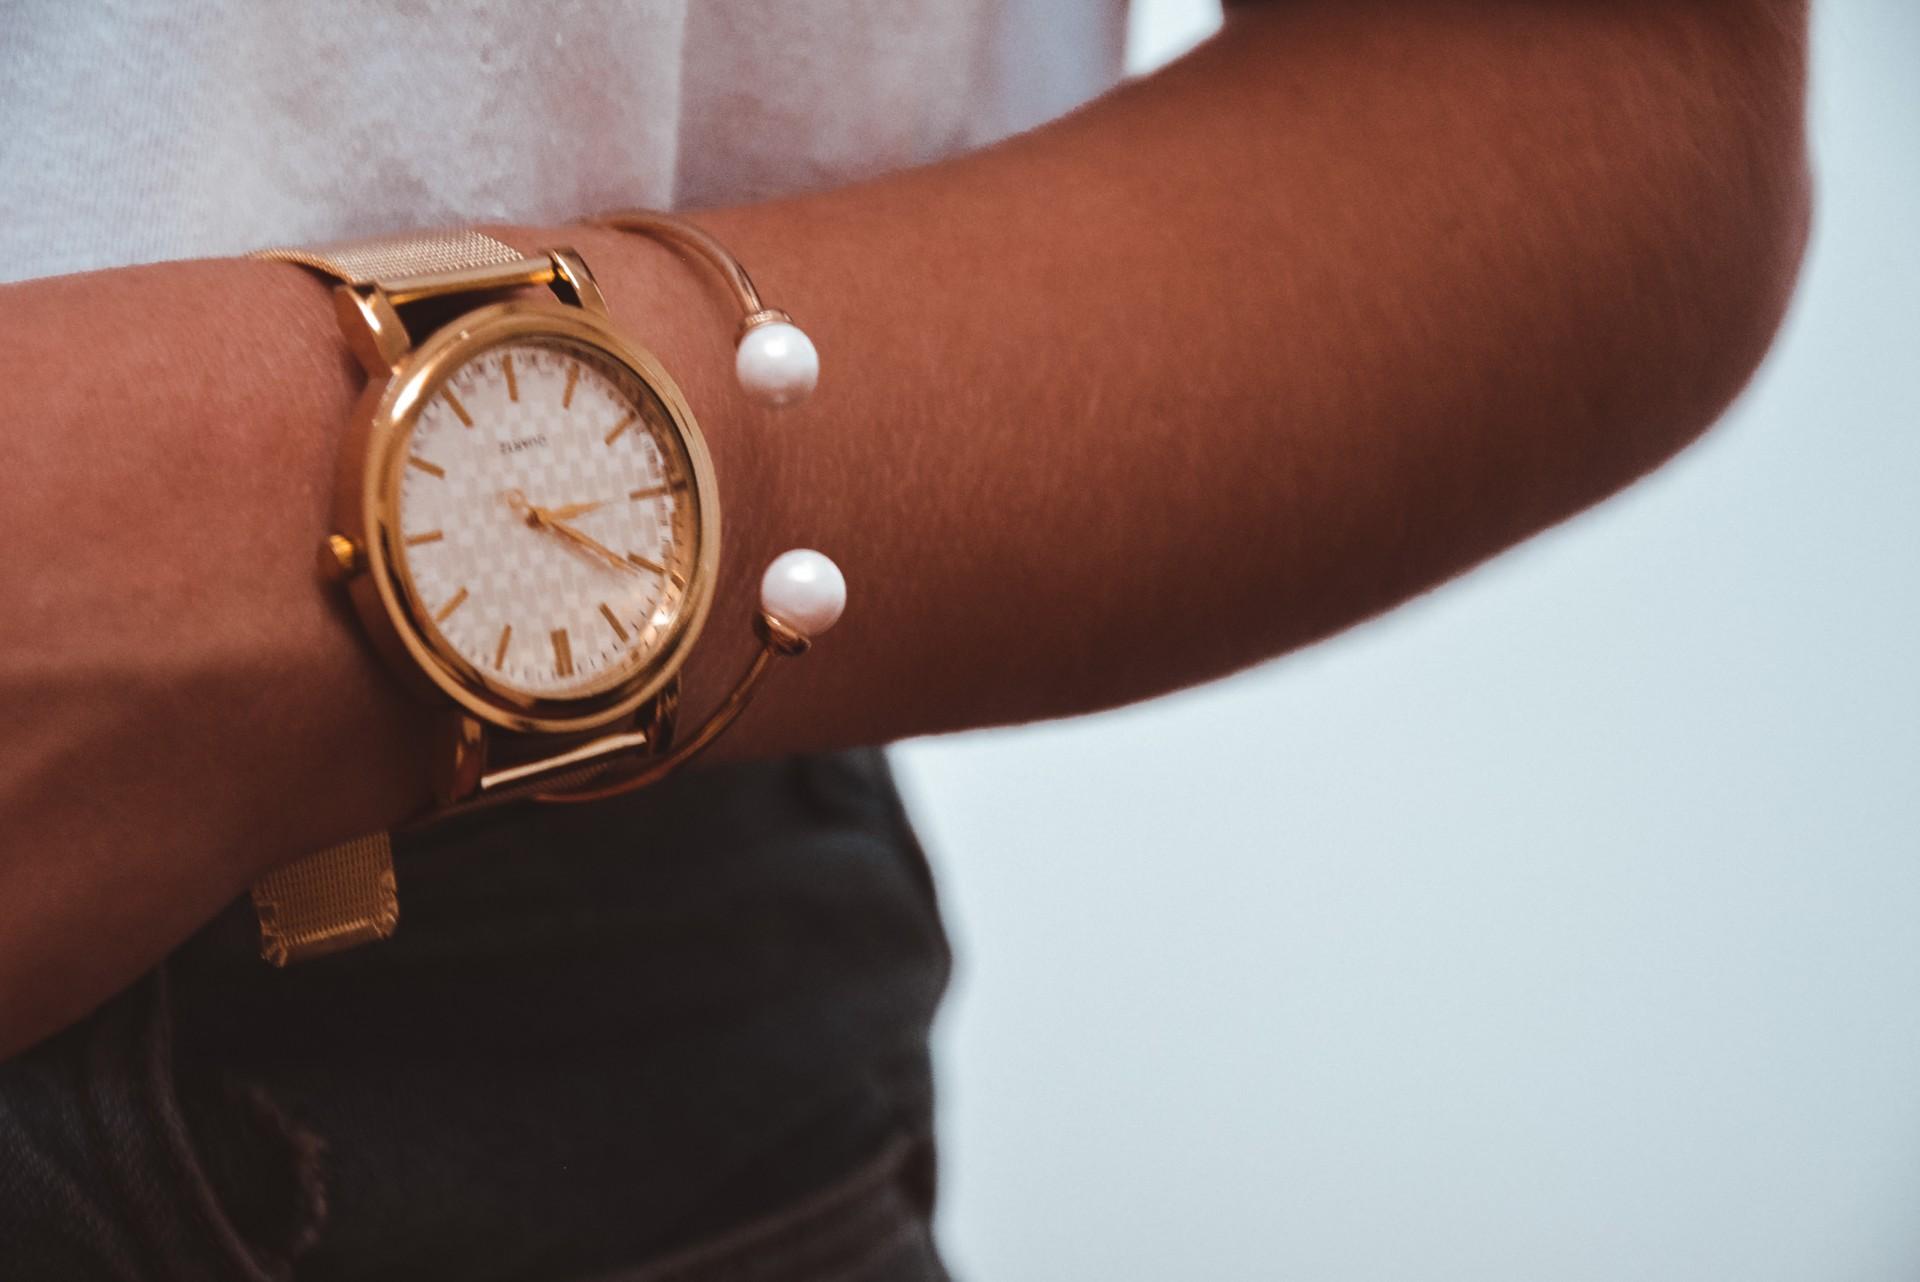 Relógio - Gold